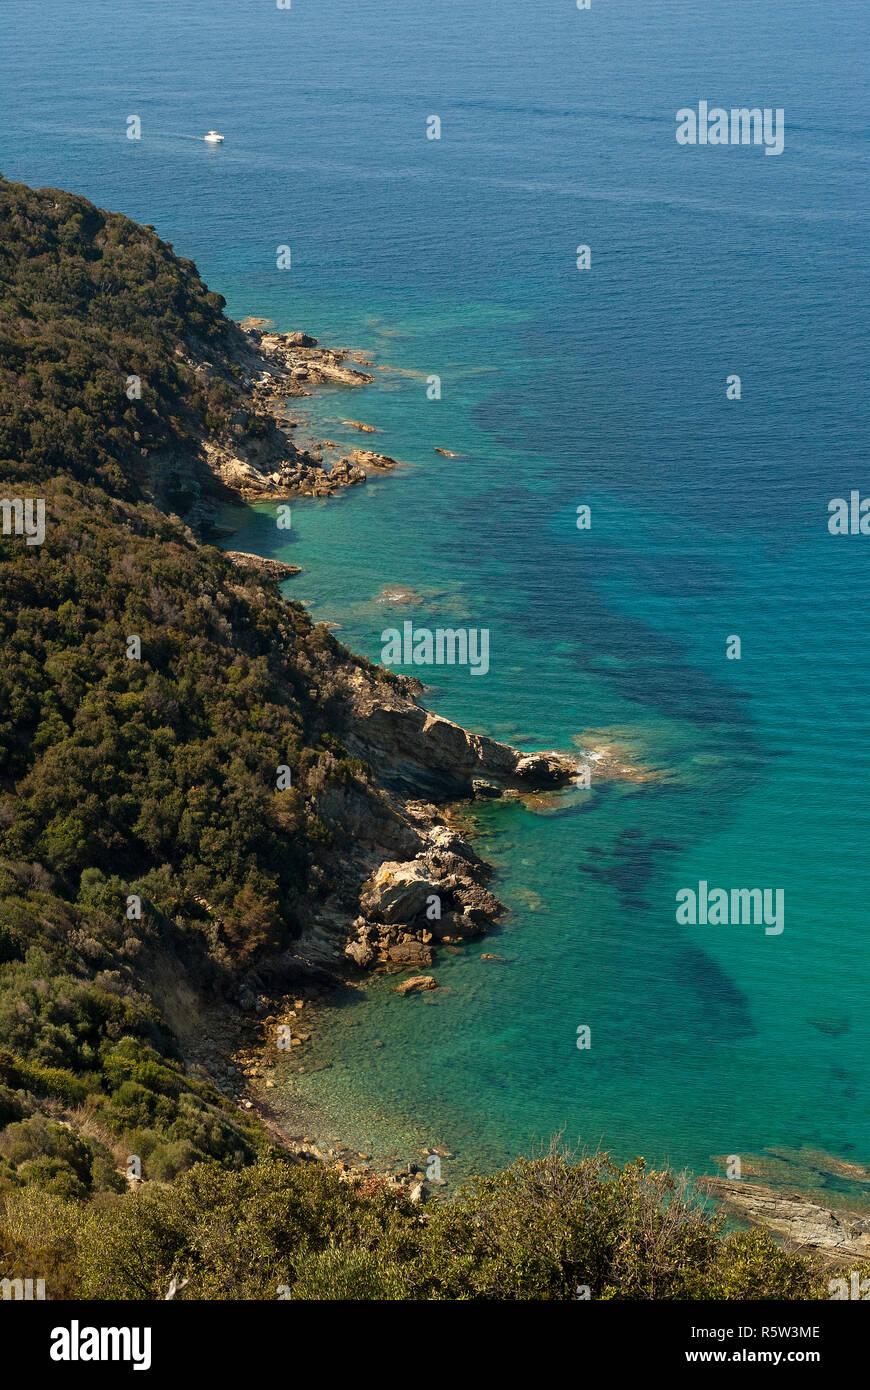 Mount Argentario coast, Grosseto, Tuscany, Italy - Stock Image